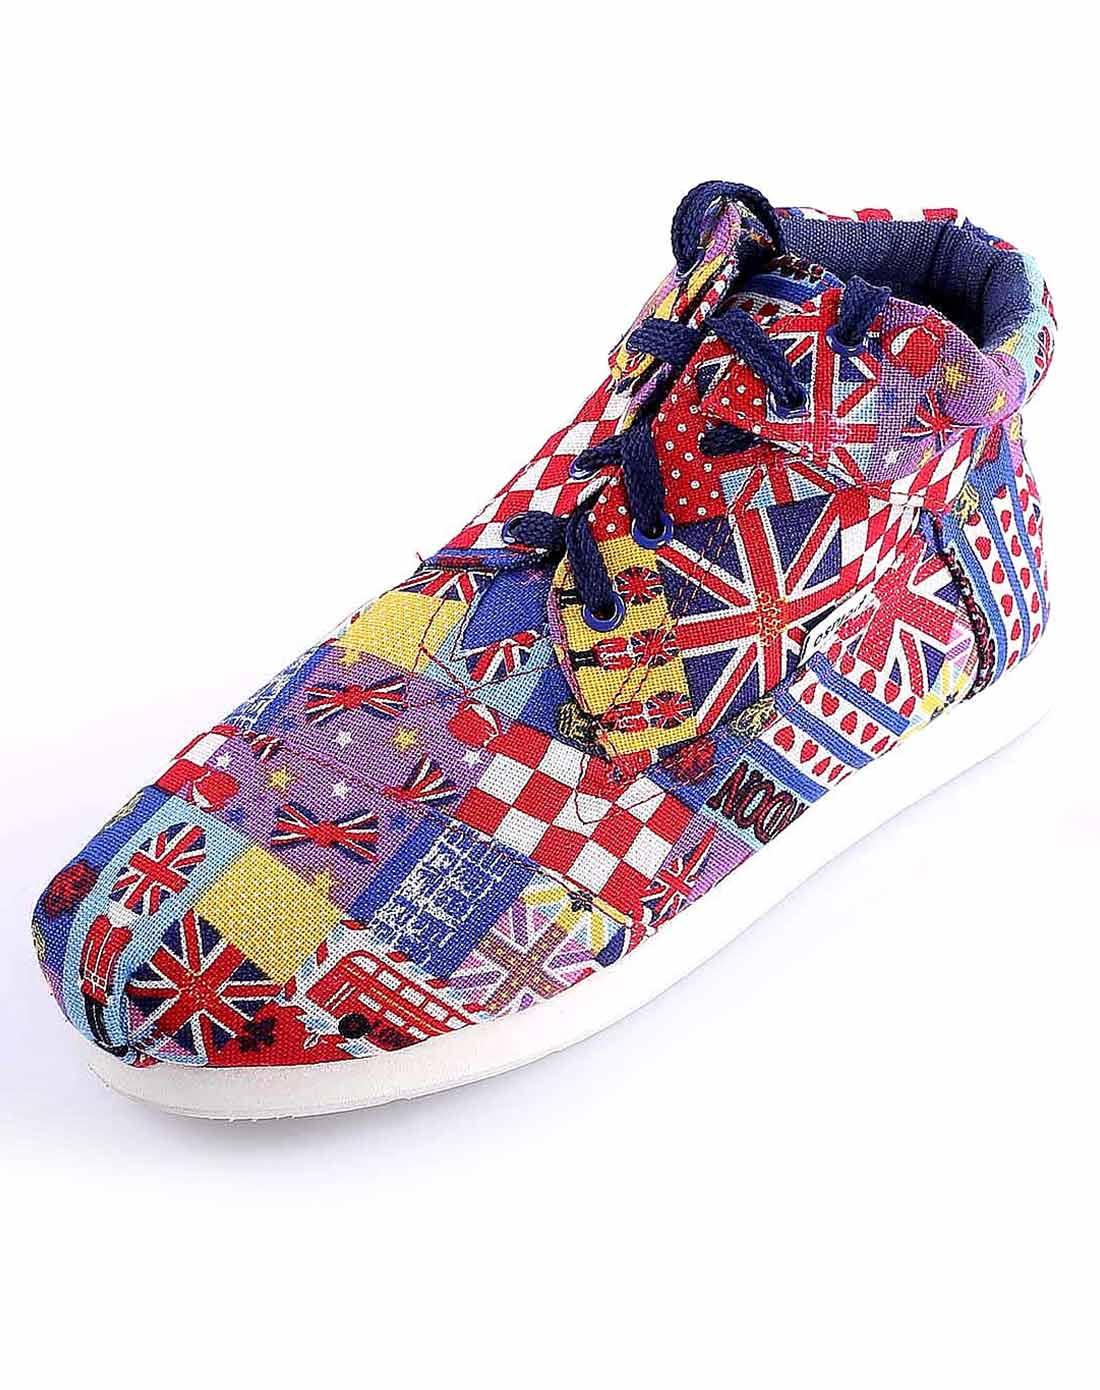 peluso 女款英国国旗/红高帮帆布鞋